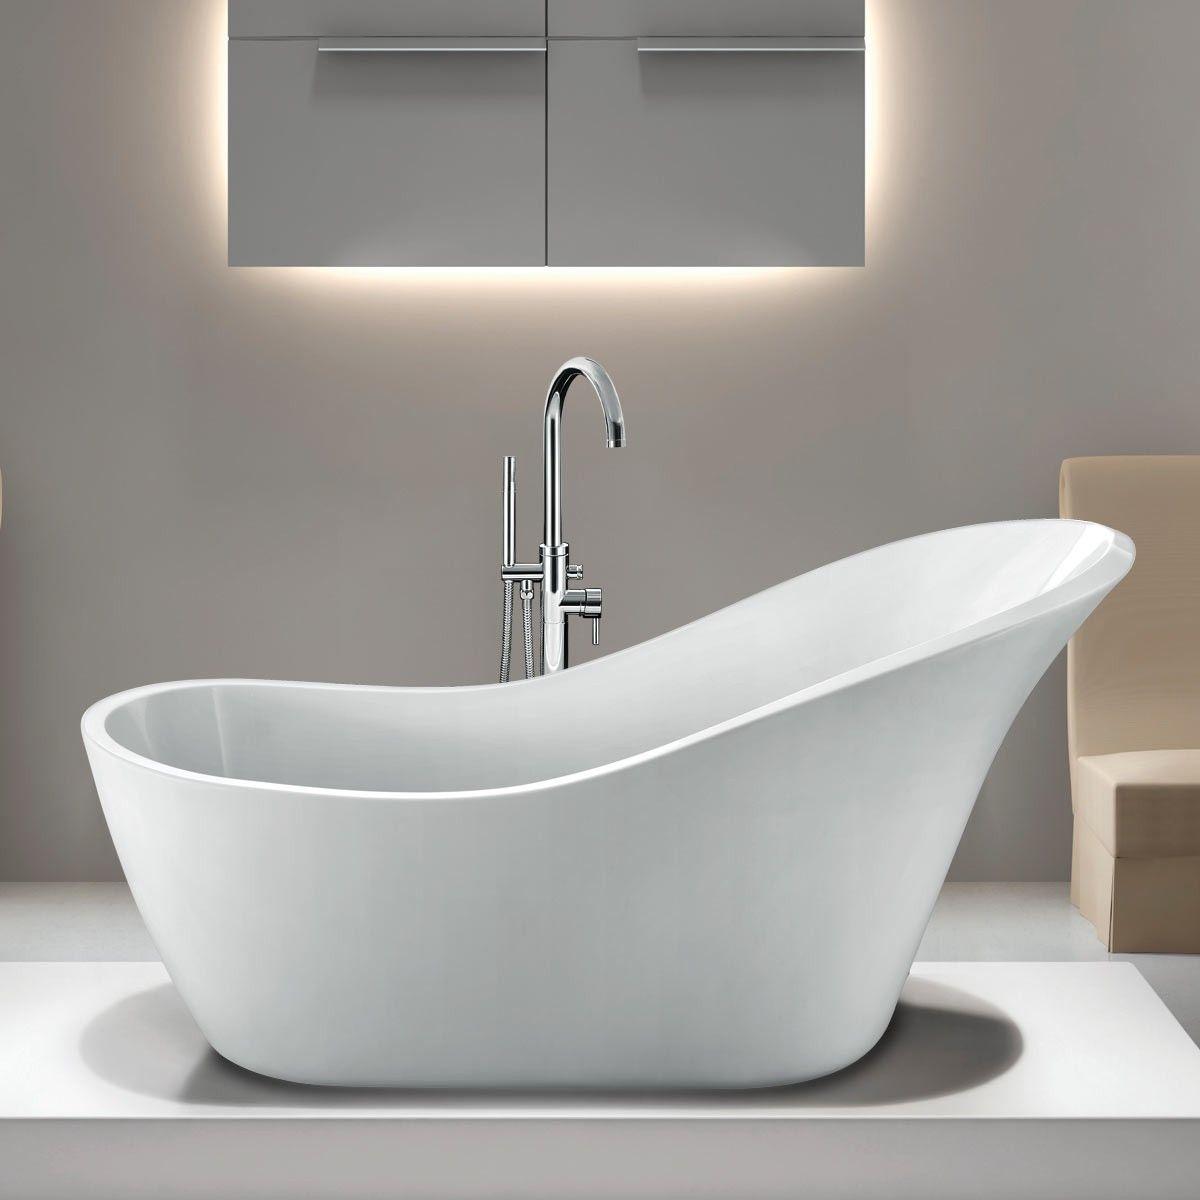 Randolph Morris 68 Inch Acrylic Slipper Freestanding Tub - No Faucet ...